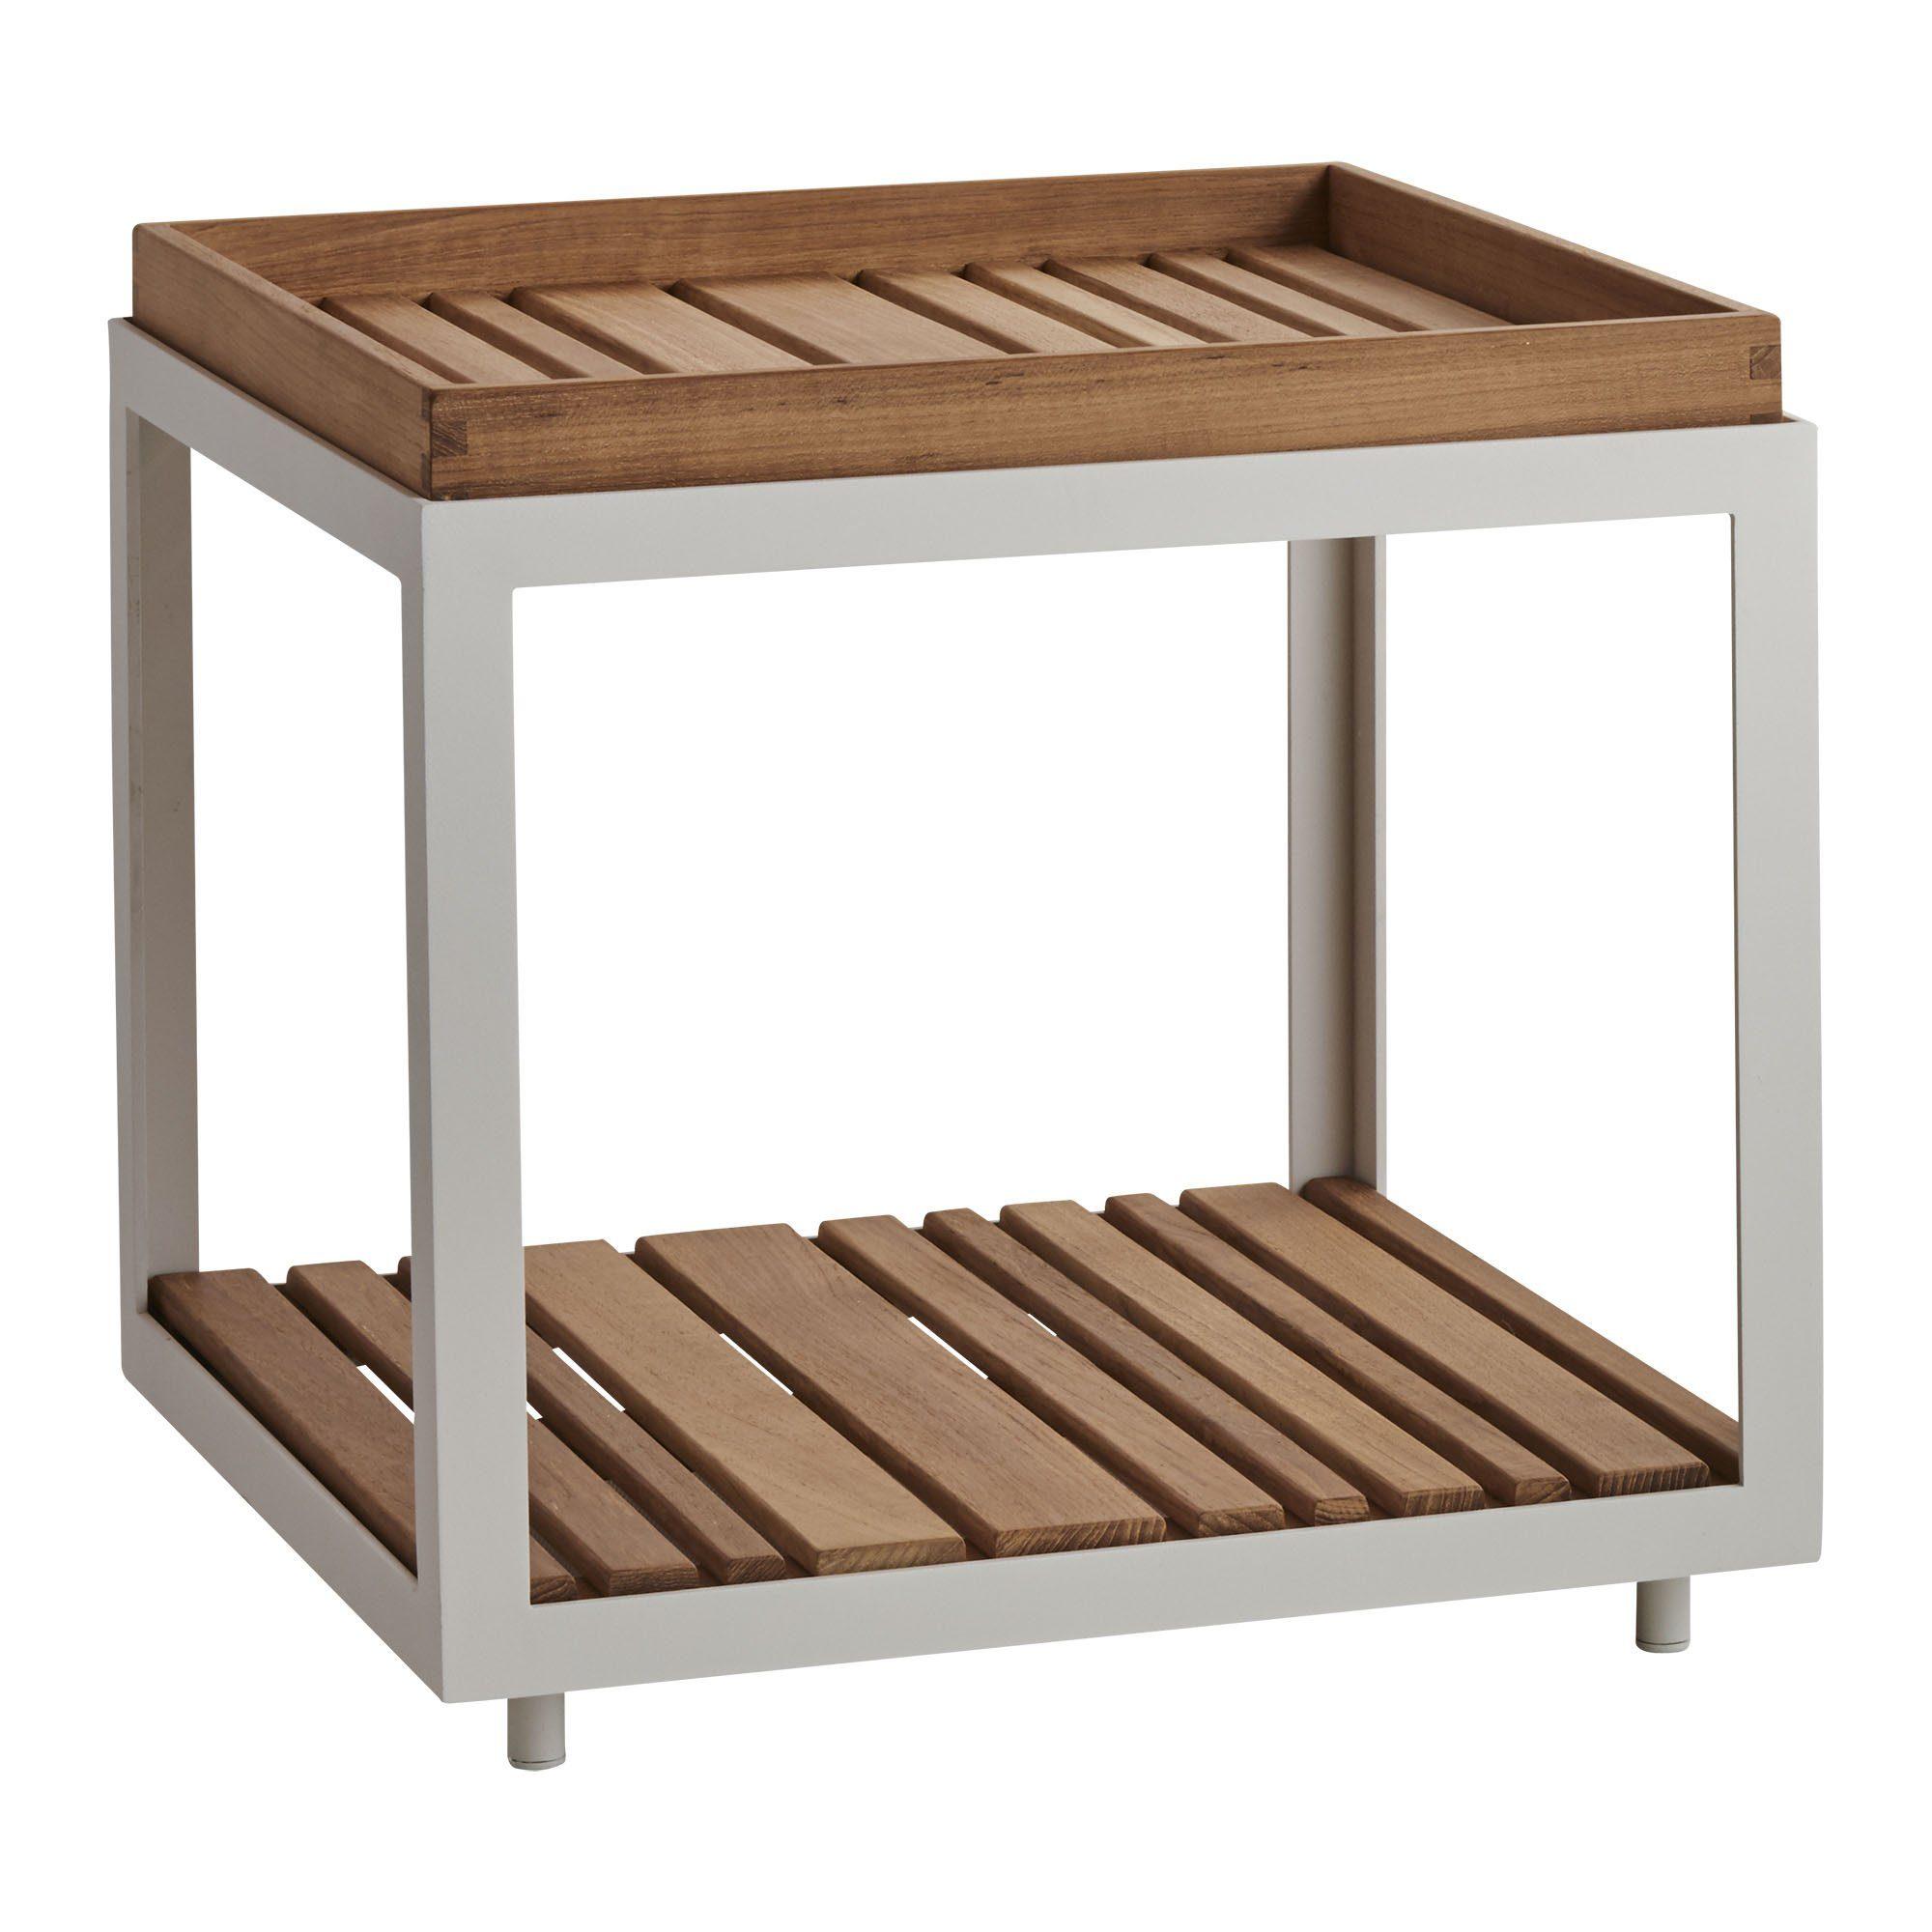 Level sidobord i vit aluminium och teak.